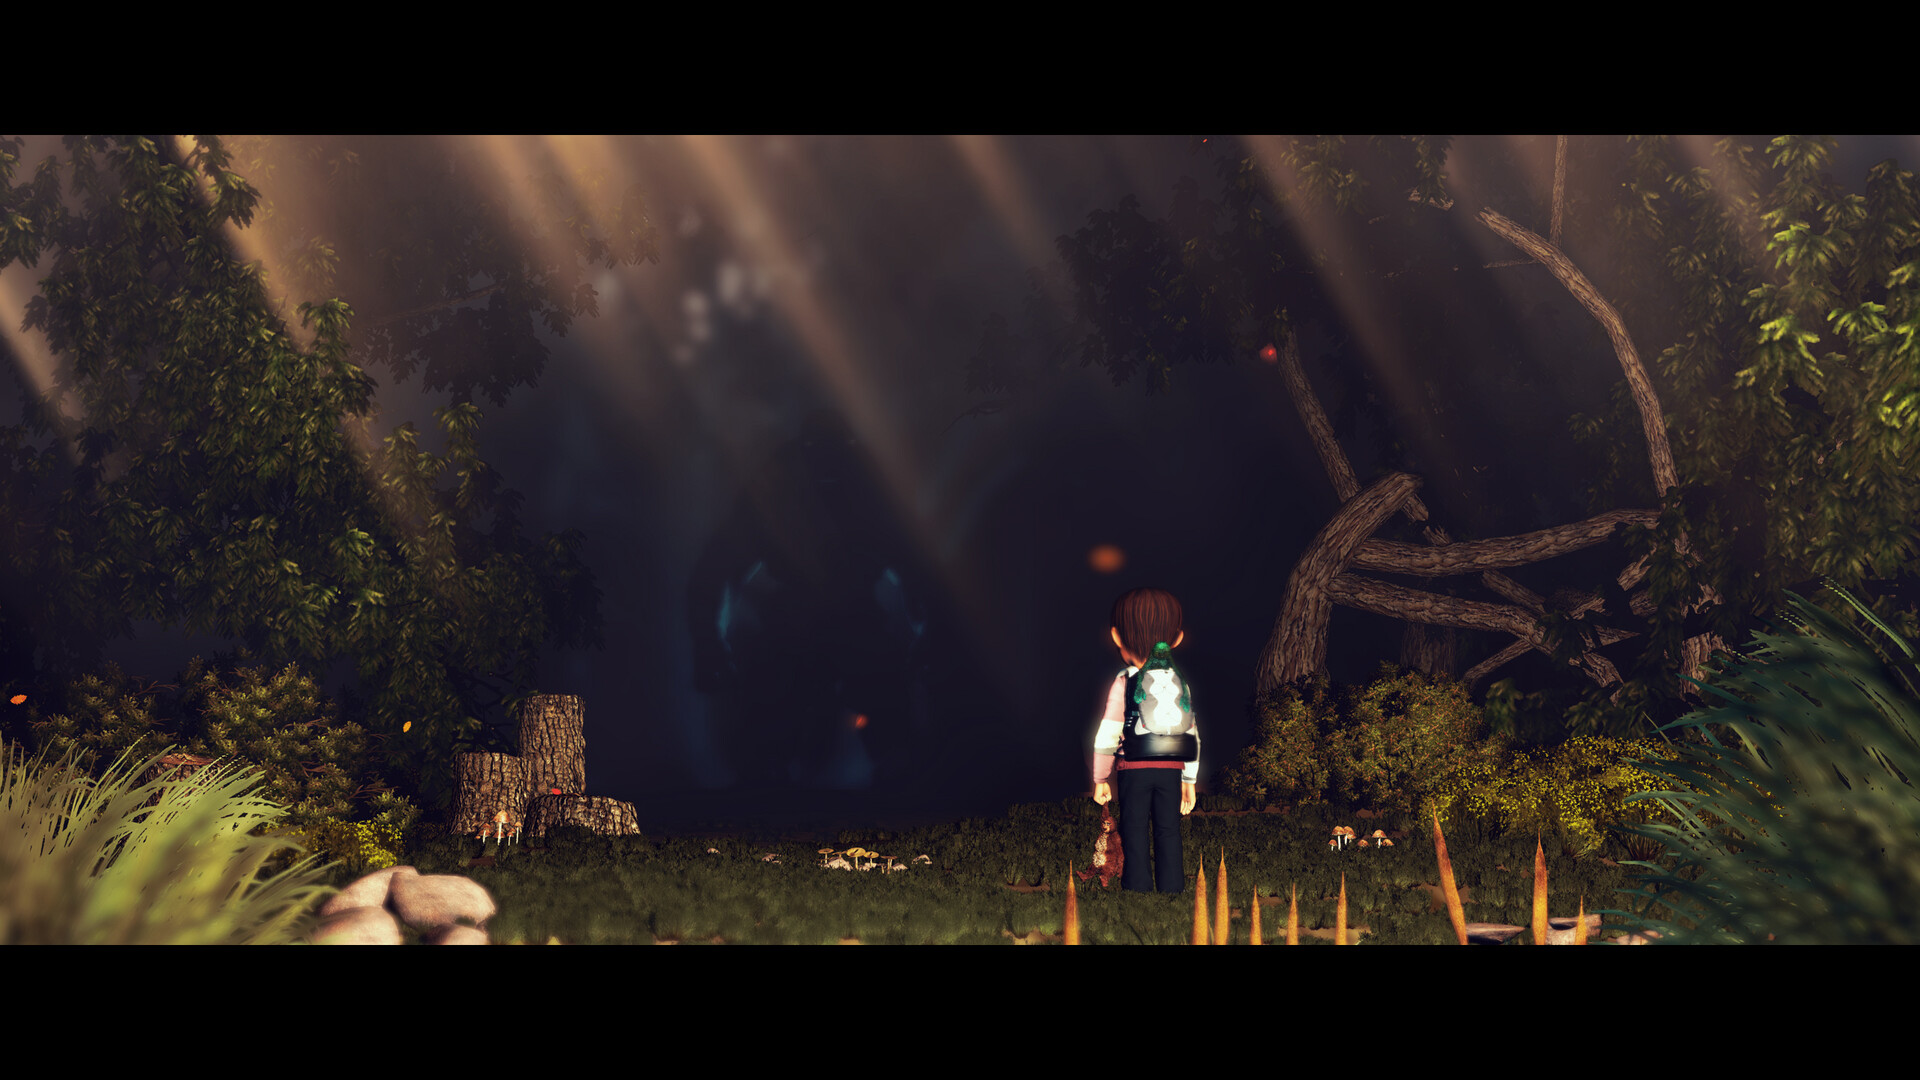 Tokomotion toko dont go to the forbiddenwoods 01